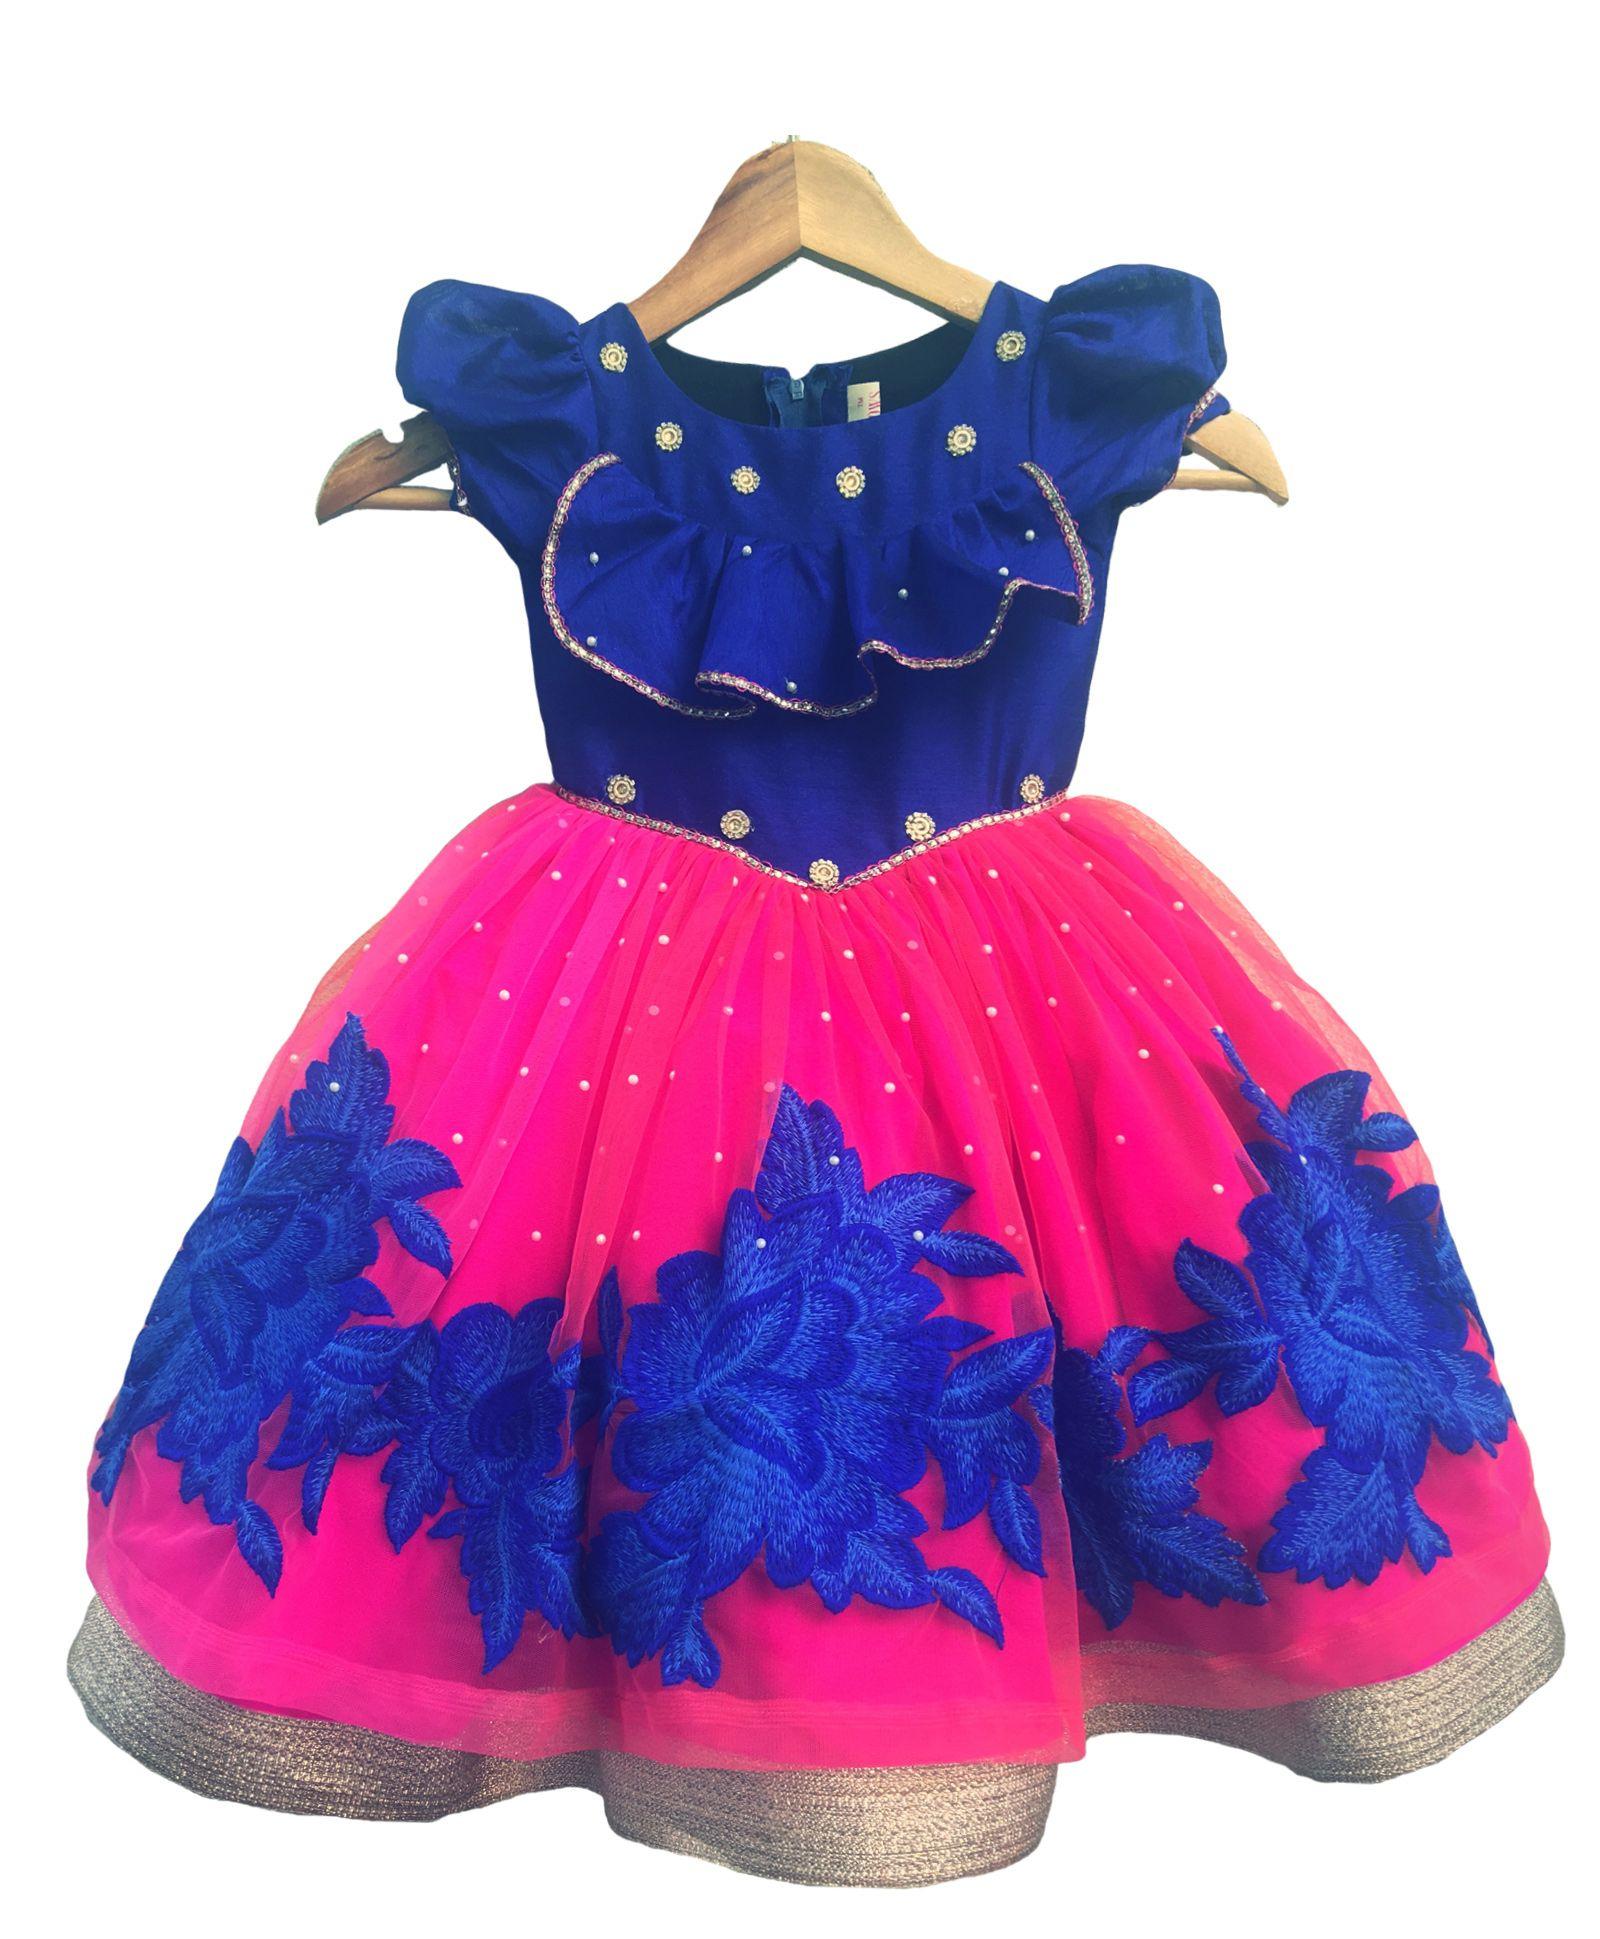 Buy Flutterbows Designer Mishka Gown Blue for Girls 5 6 Years